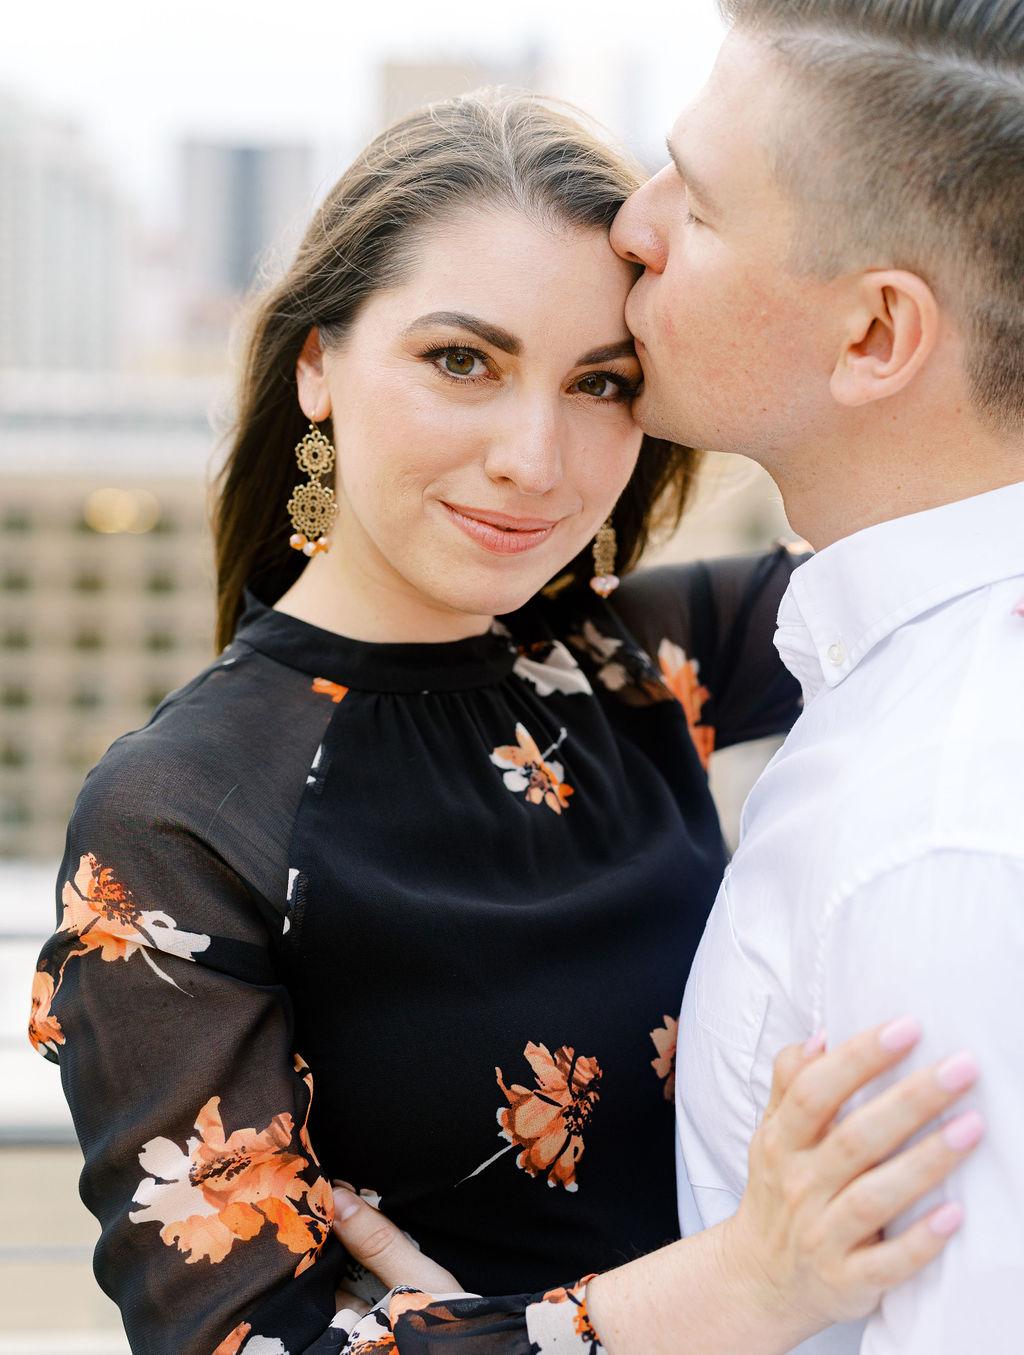 Austin-Intimate-Wedding-Elopement-Photograper-Film-Downtown-Engagement-Session-San-Antonio-Riverwalk-35.jpg